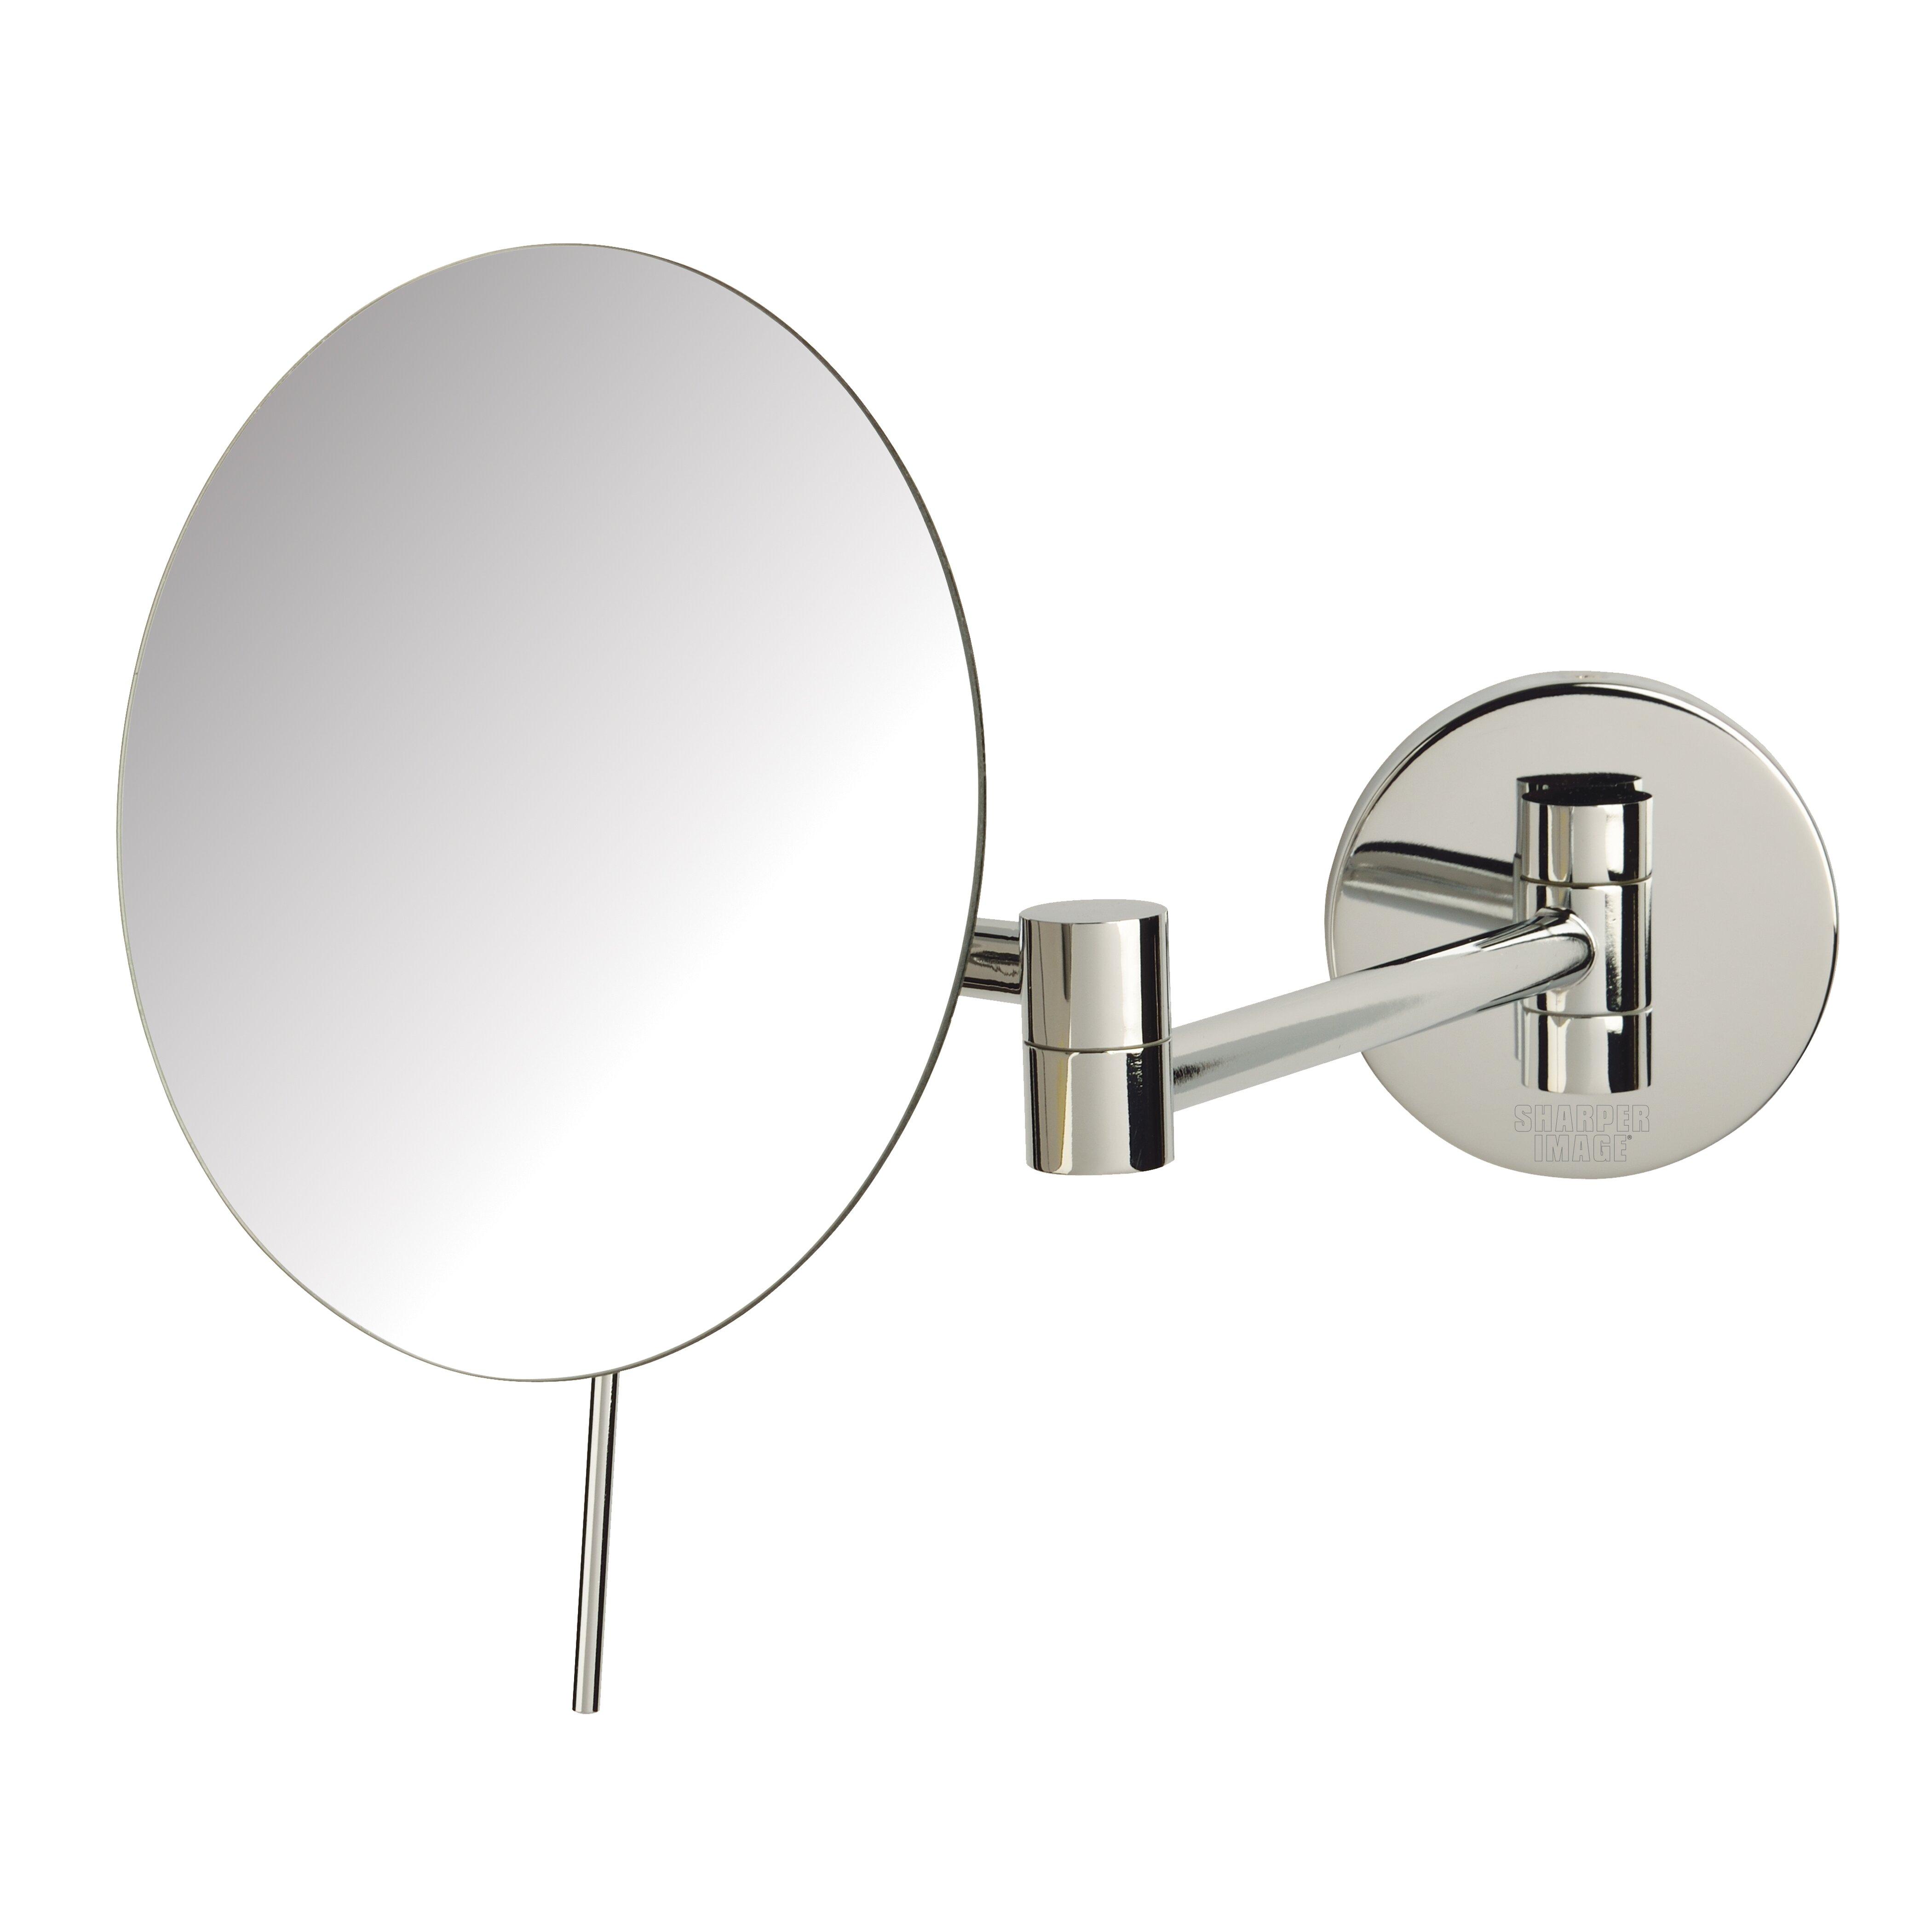 jerdon 5x magnification wall mount mirror reviews wayfair. Black Bedroom Furniture Sets. Home Design Ideas